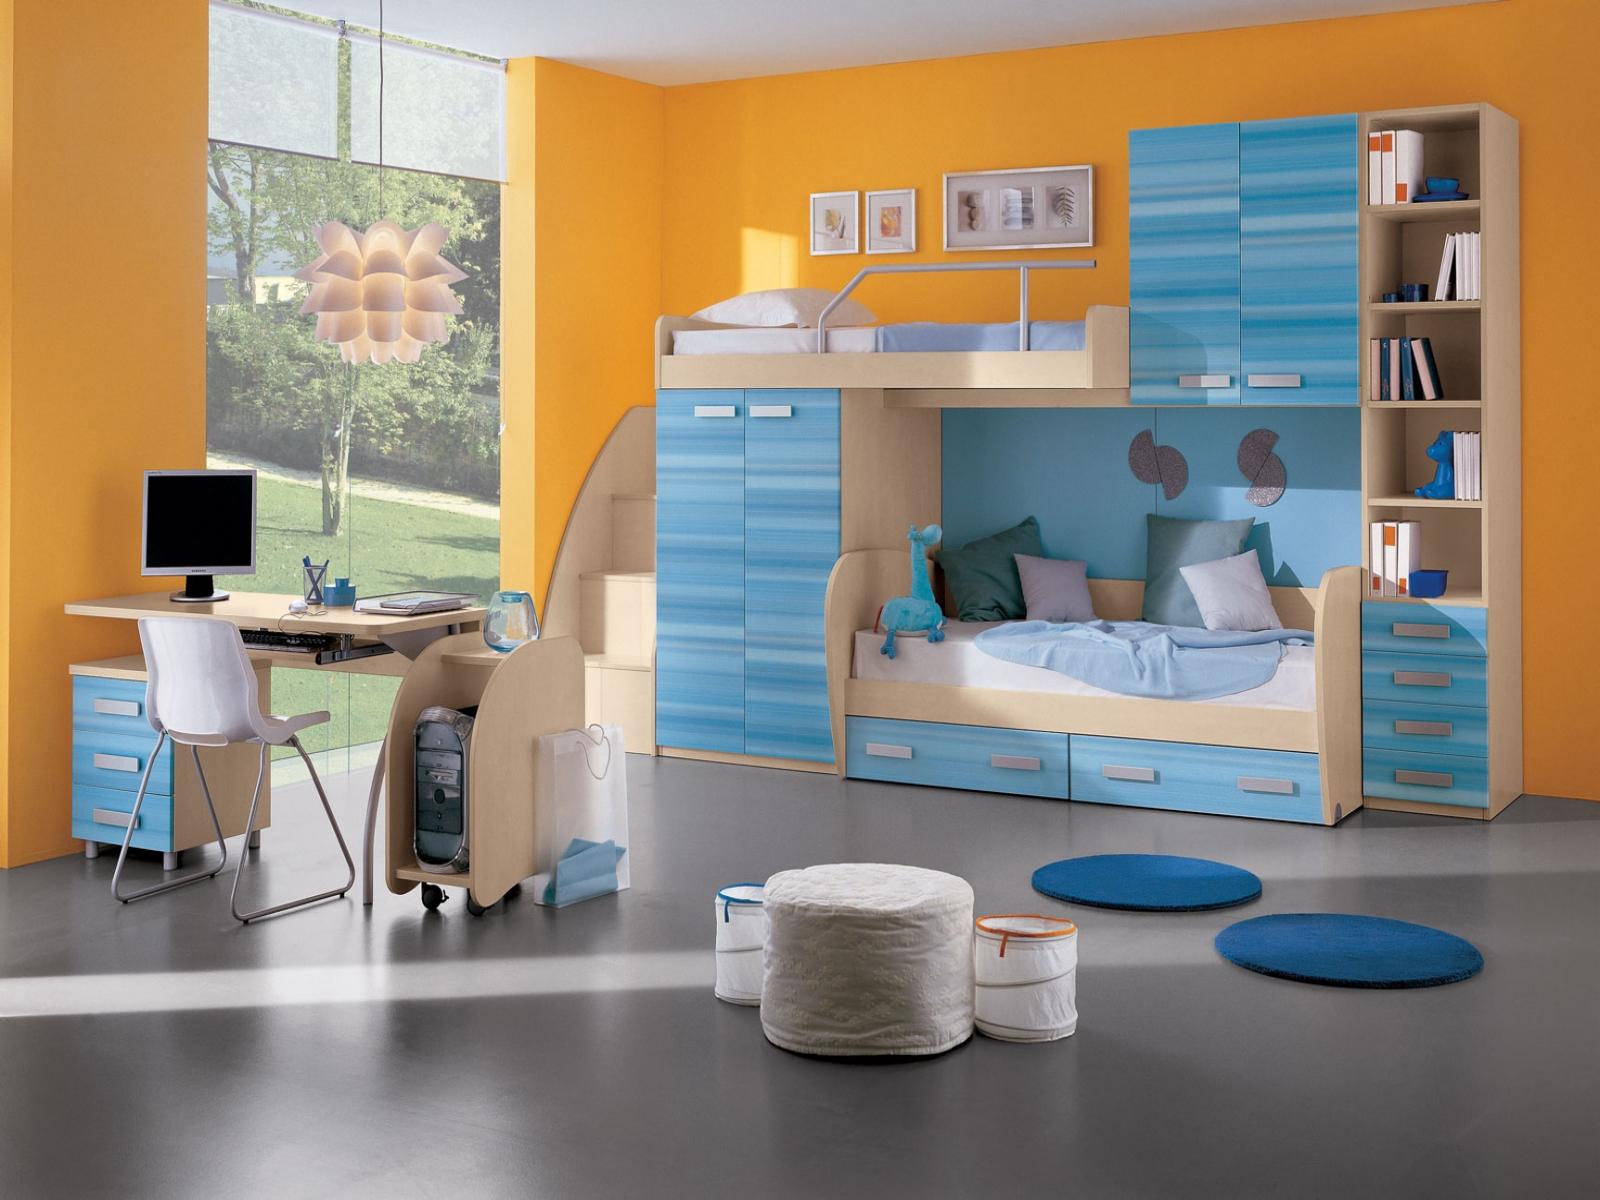 1600x1200-modern-kids-bedroom-designs-for-girls-stunning-ideas-for-kids